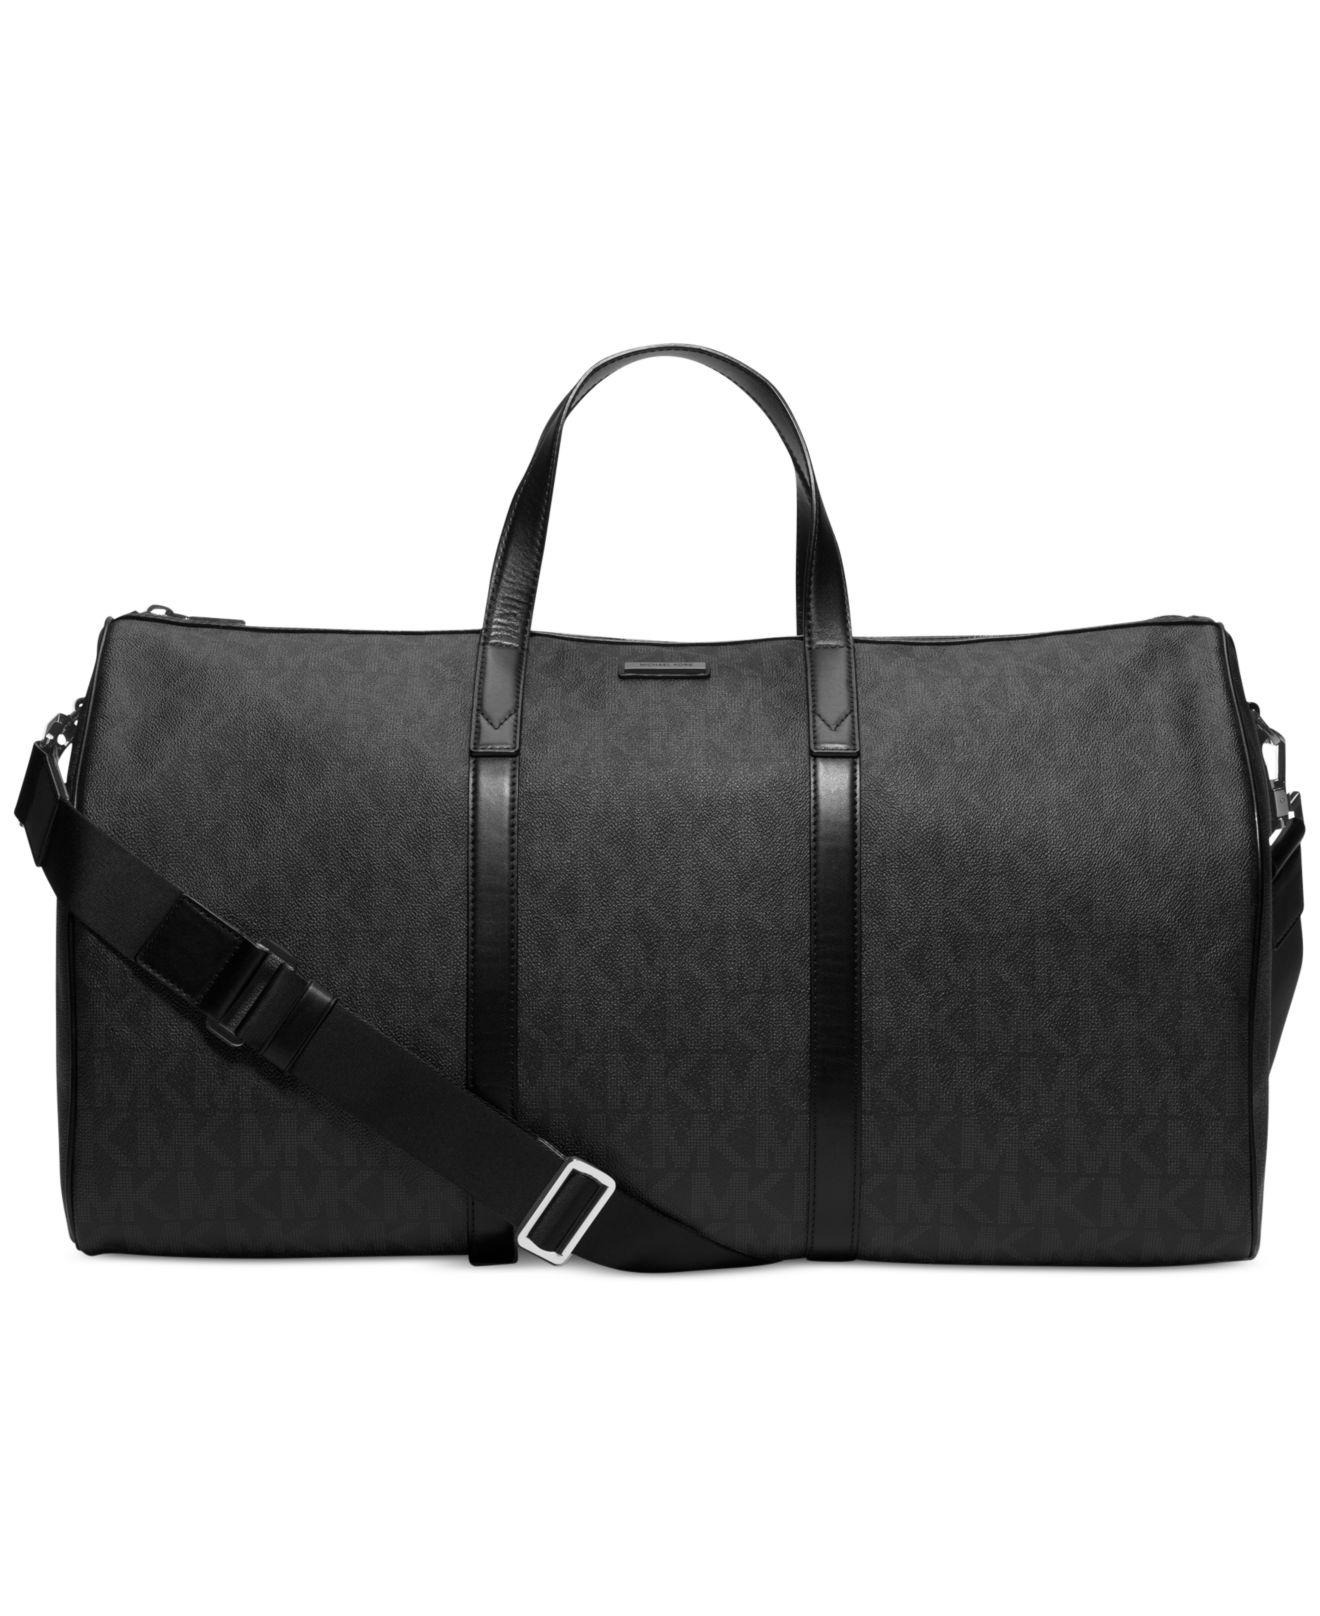 05b2effb4d09 Lyst - Michael Kors Signature Logo Jet Set Travel Duffle Bag in ...